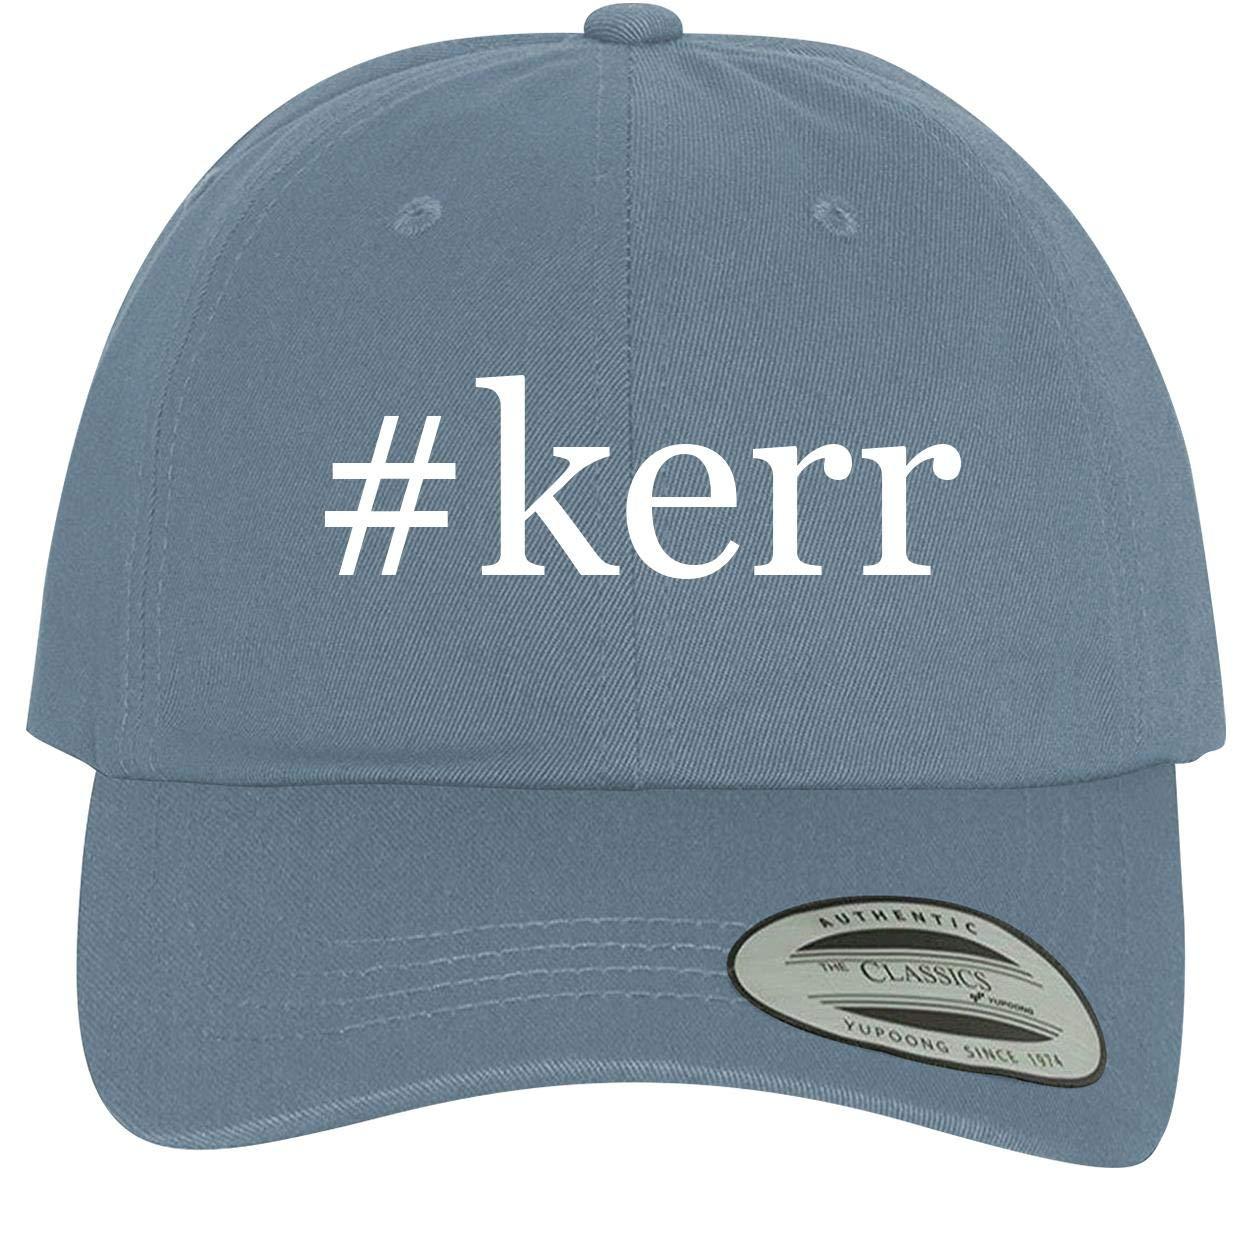 Comfortable Dad Hat Baseball Cap BH Cool Designs #Kerr